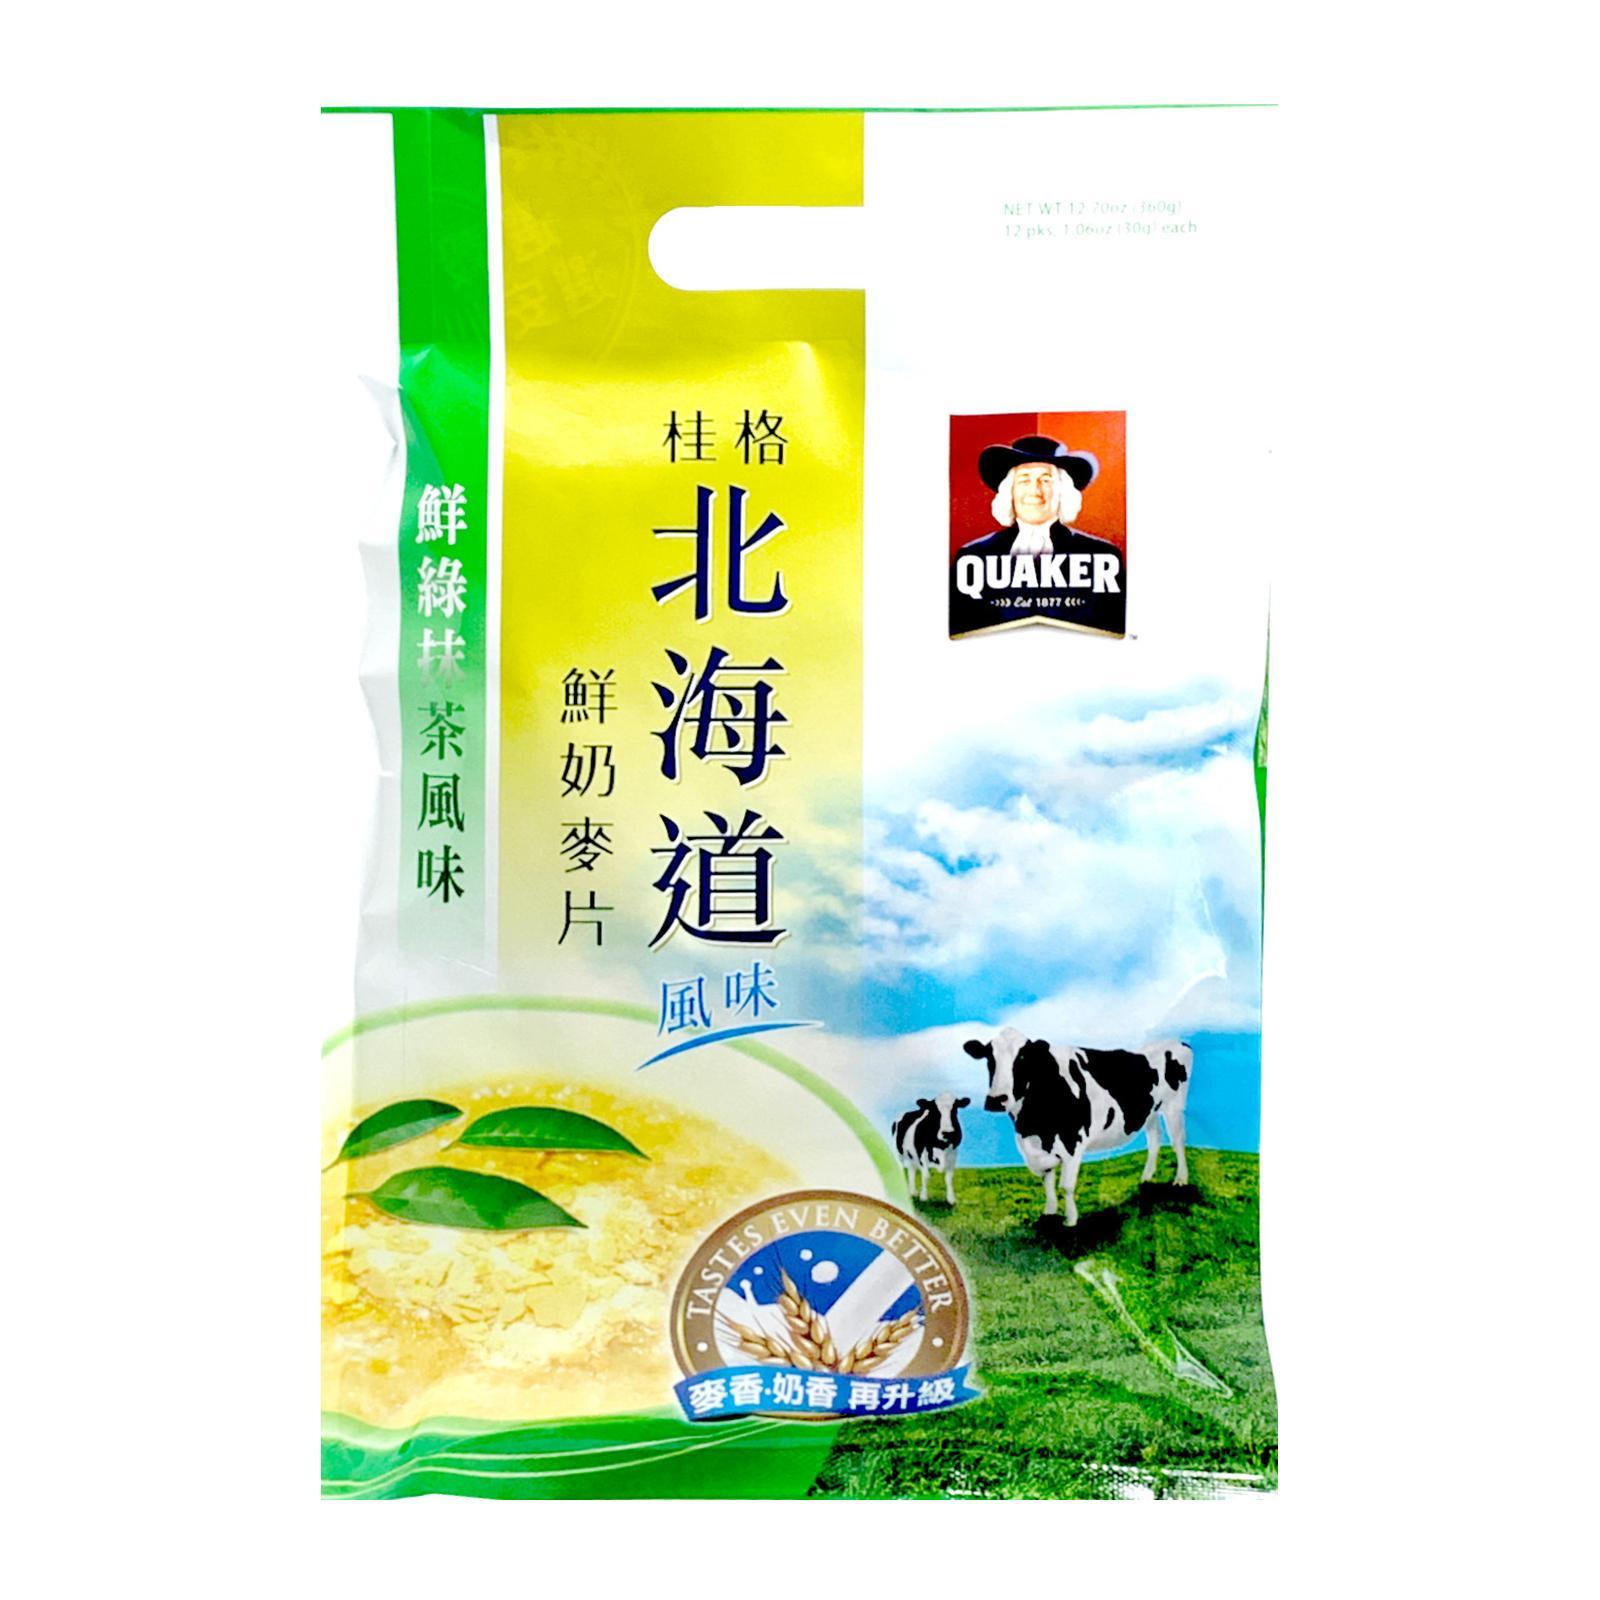 QUAKER Hokkaido Matcha Oatmeal Instant Beverage